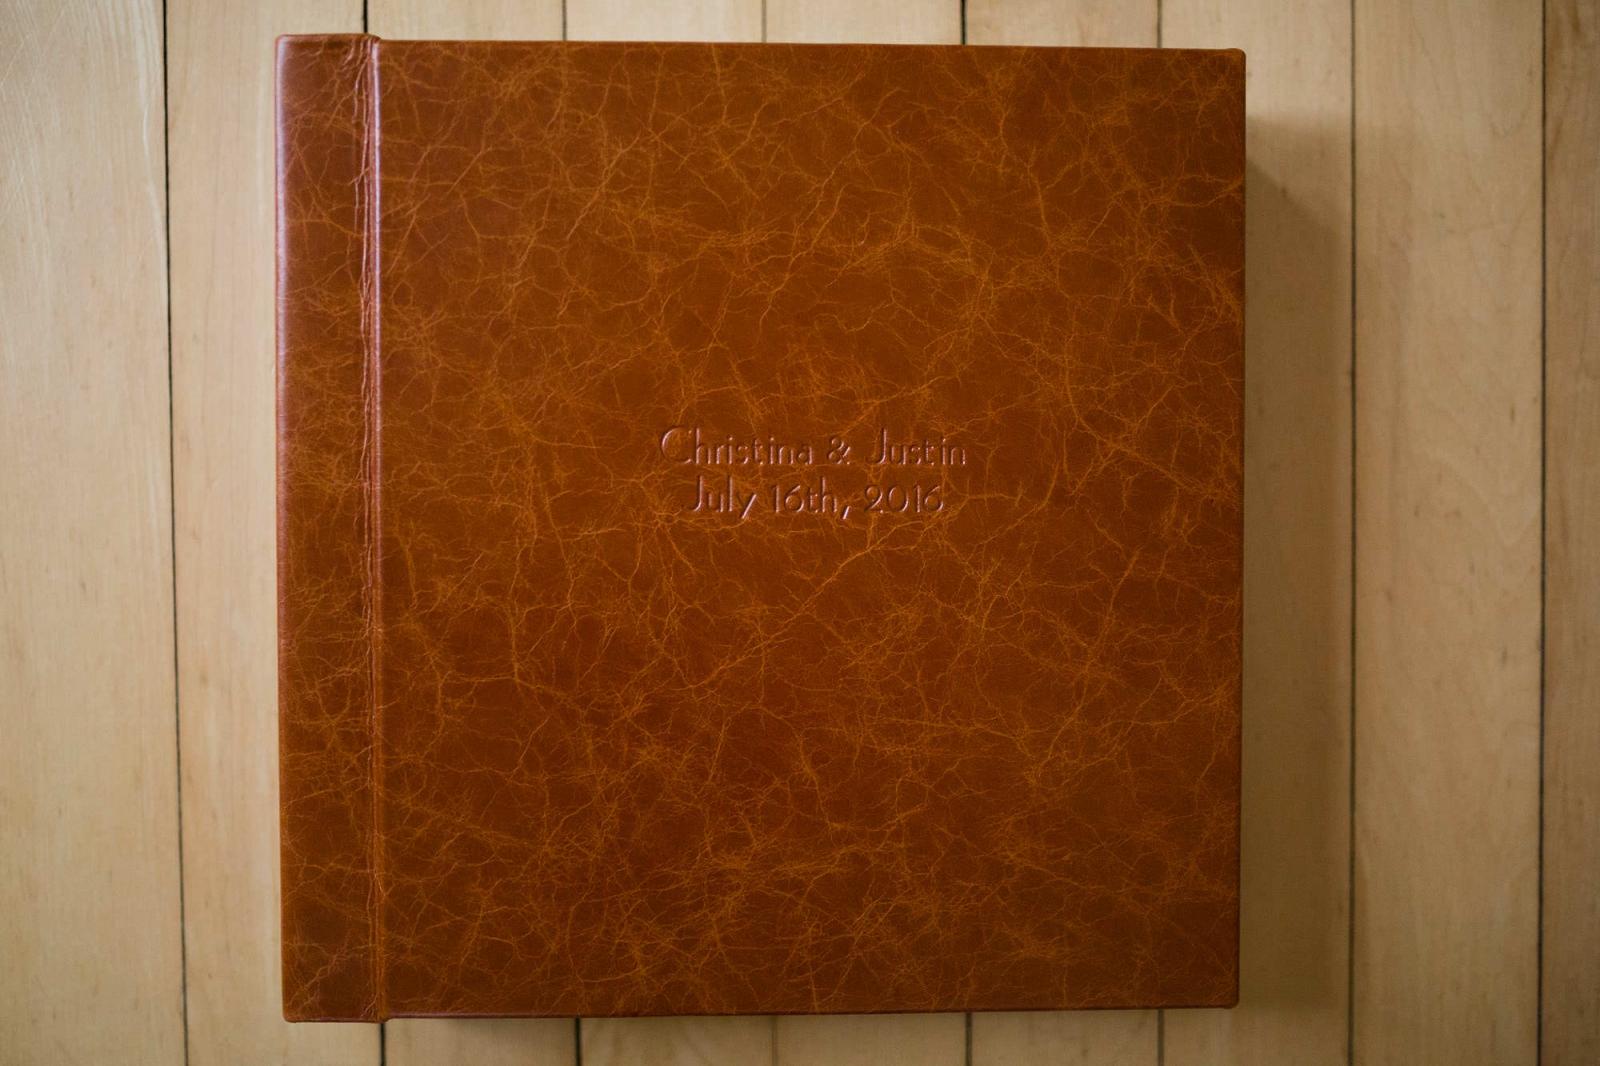 coastal-maine-wedding-album (12)